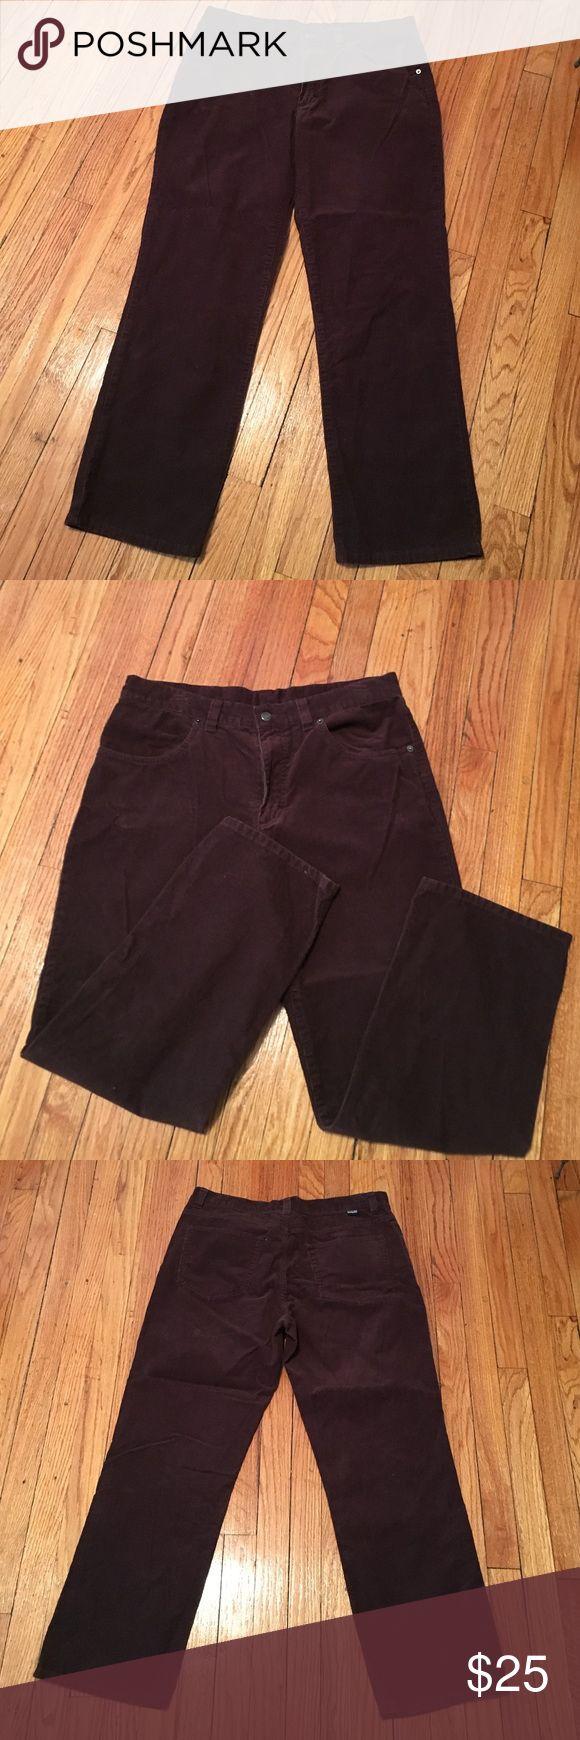 Patagonia MENS Corduroy Pants Inseam: 29 inches 100% Cotton Patagonia Pants Corduroy